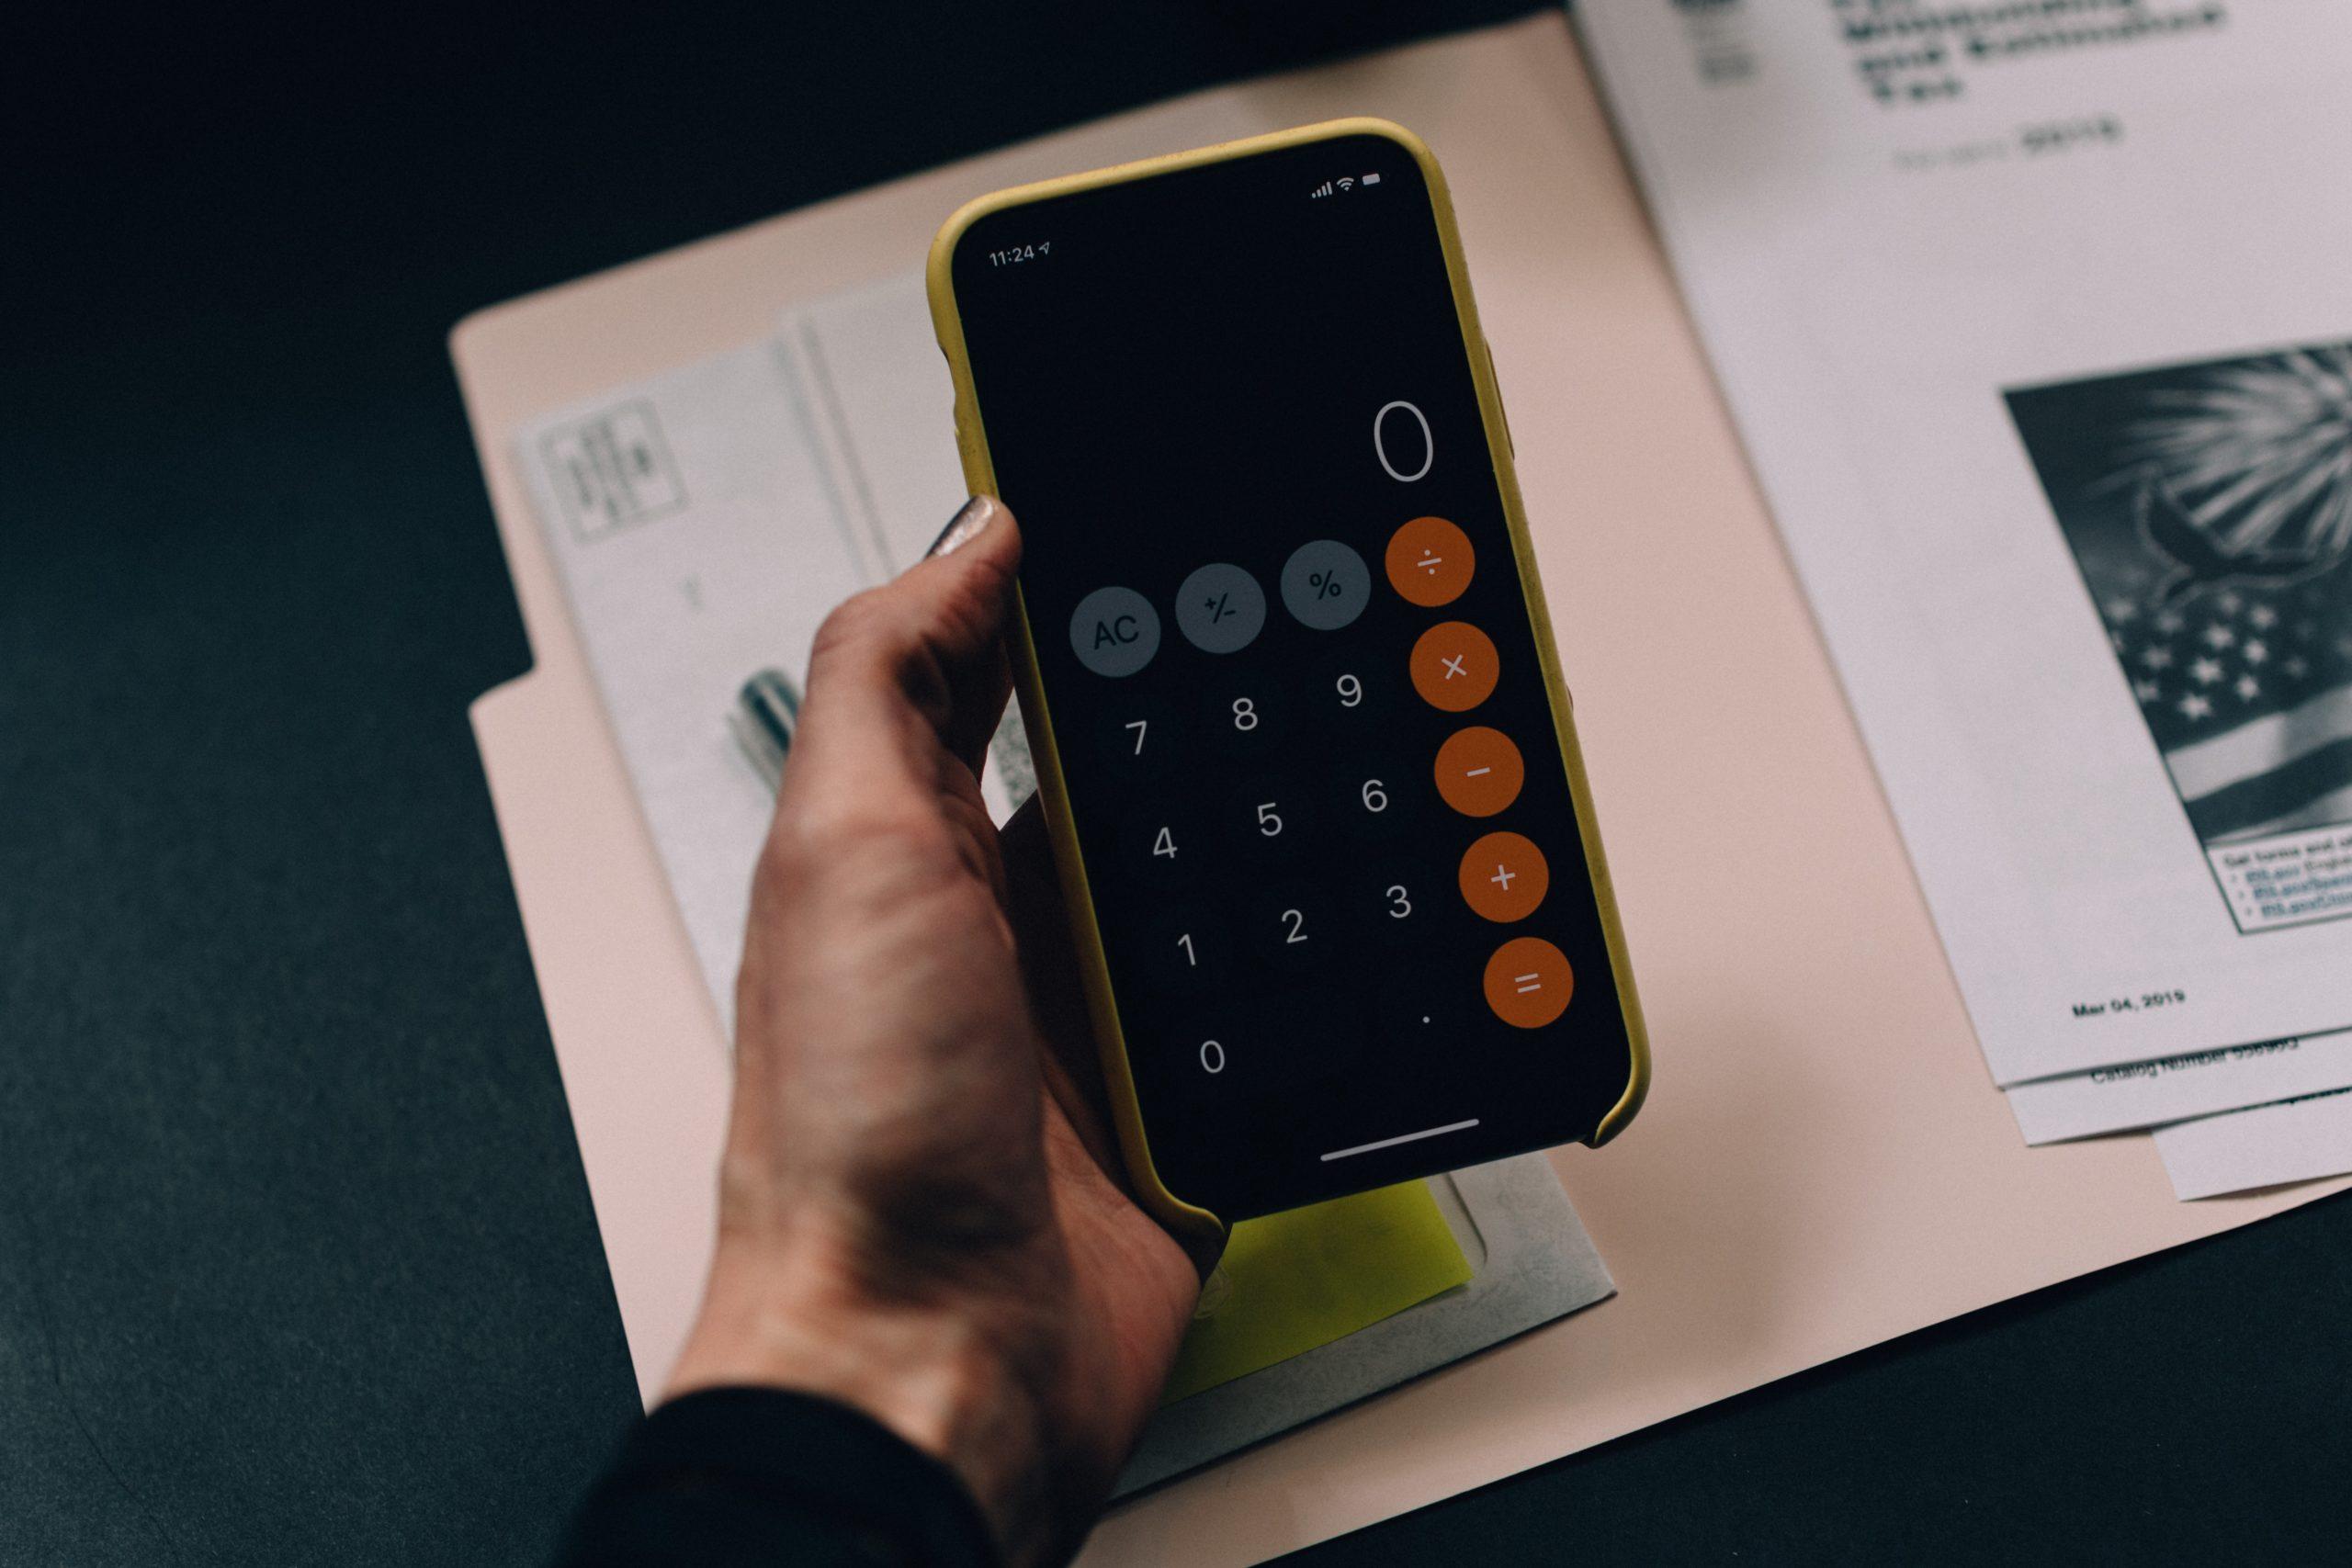 Percentage increase calculator